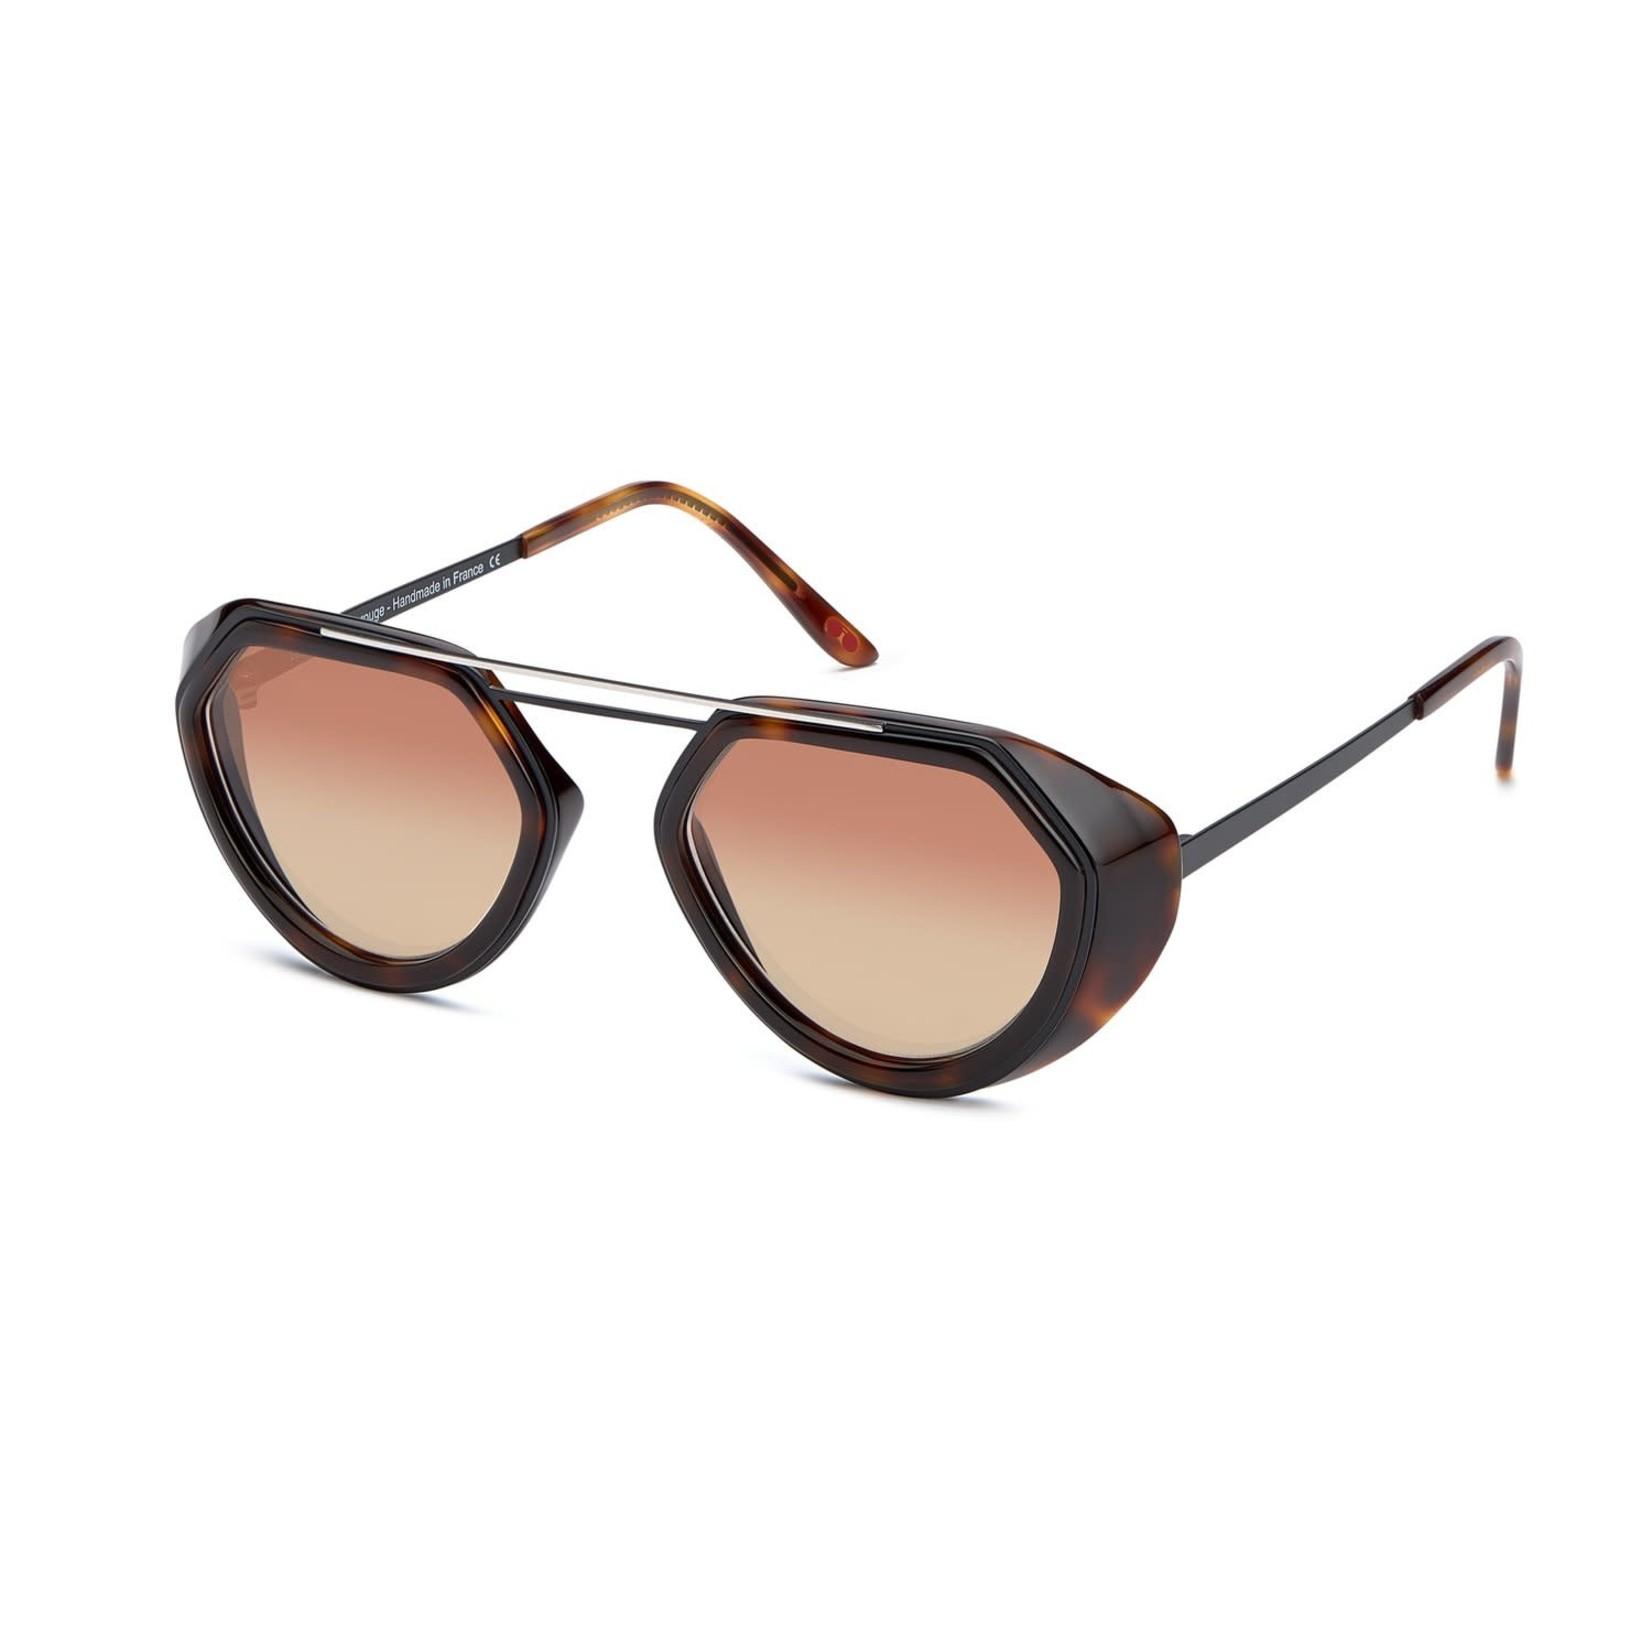 La Petite Lunette Eyewear LPLR Volune Sun